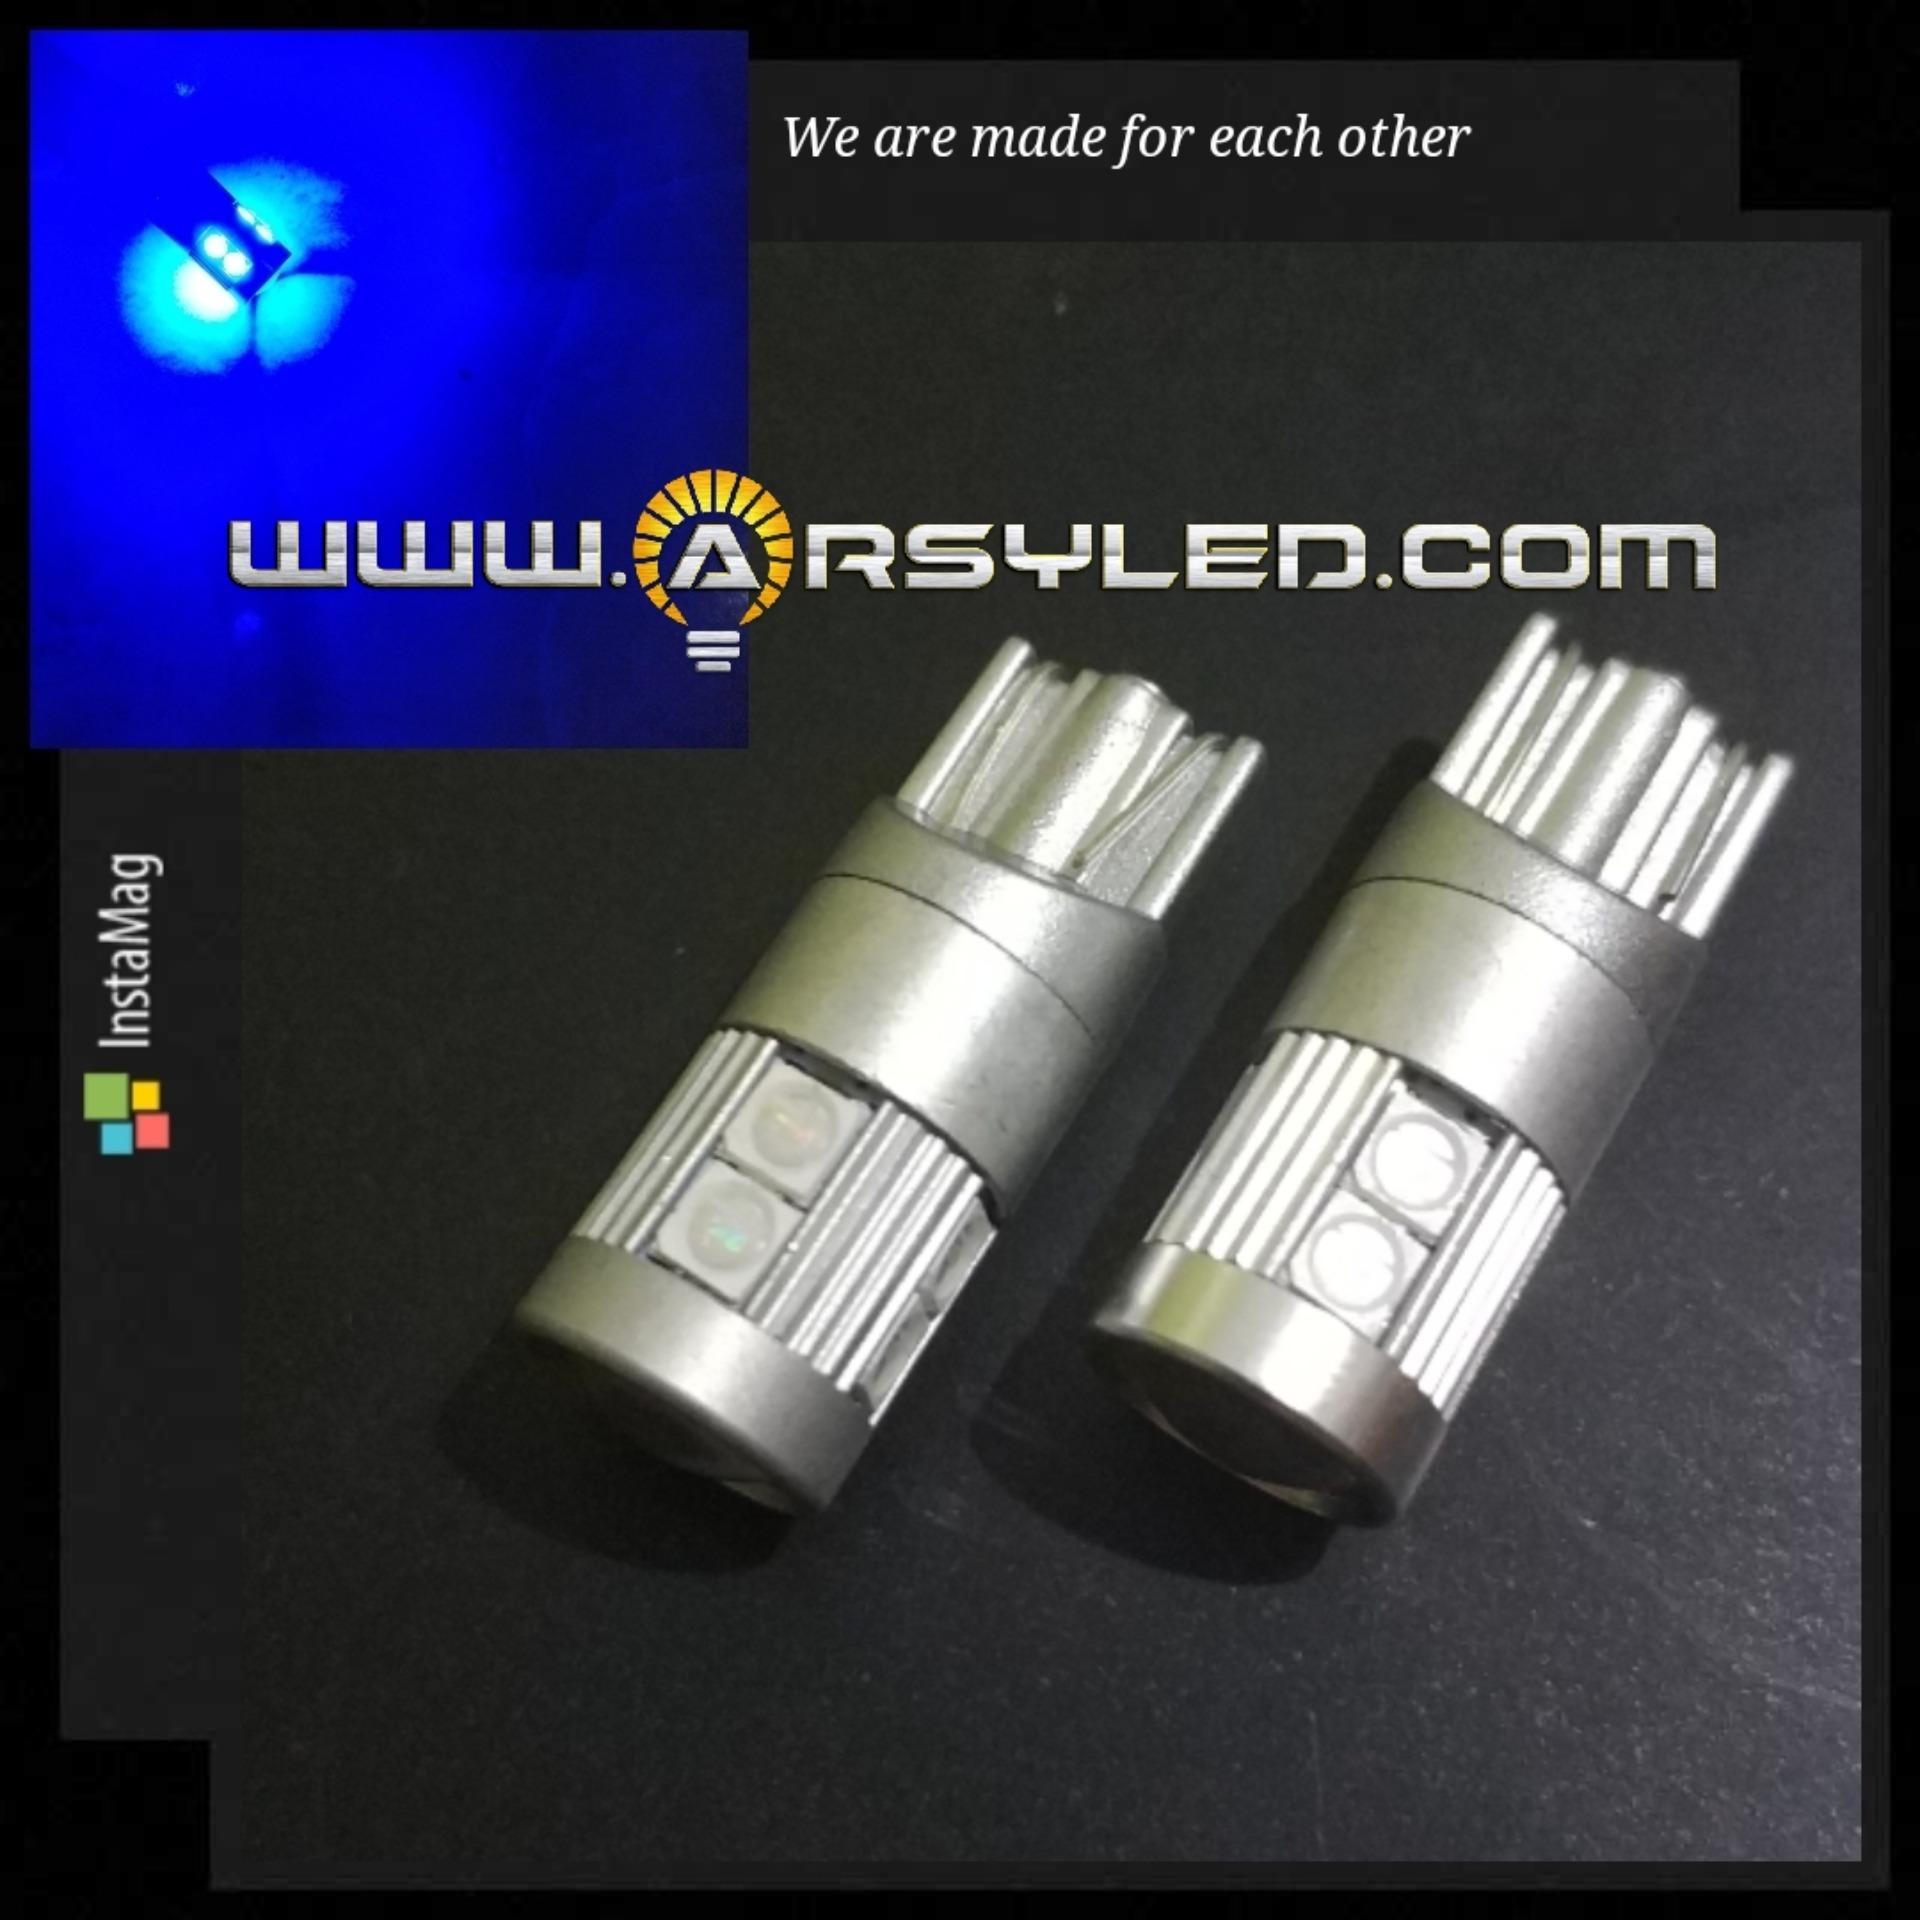 2 Biji Lampu LED T10 VLITE 9 titik 3030 Senja Sein Sen Mundur Super Bright MOTOR MOBIL ARSYSTORE BRIO MOBILIO ERTIGA AVANZA XENIA - Biru